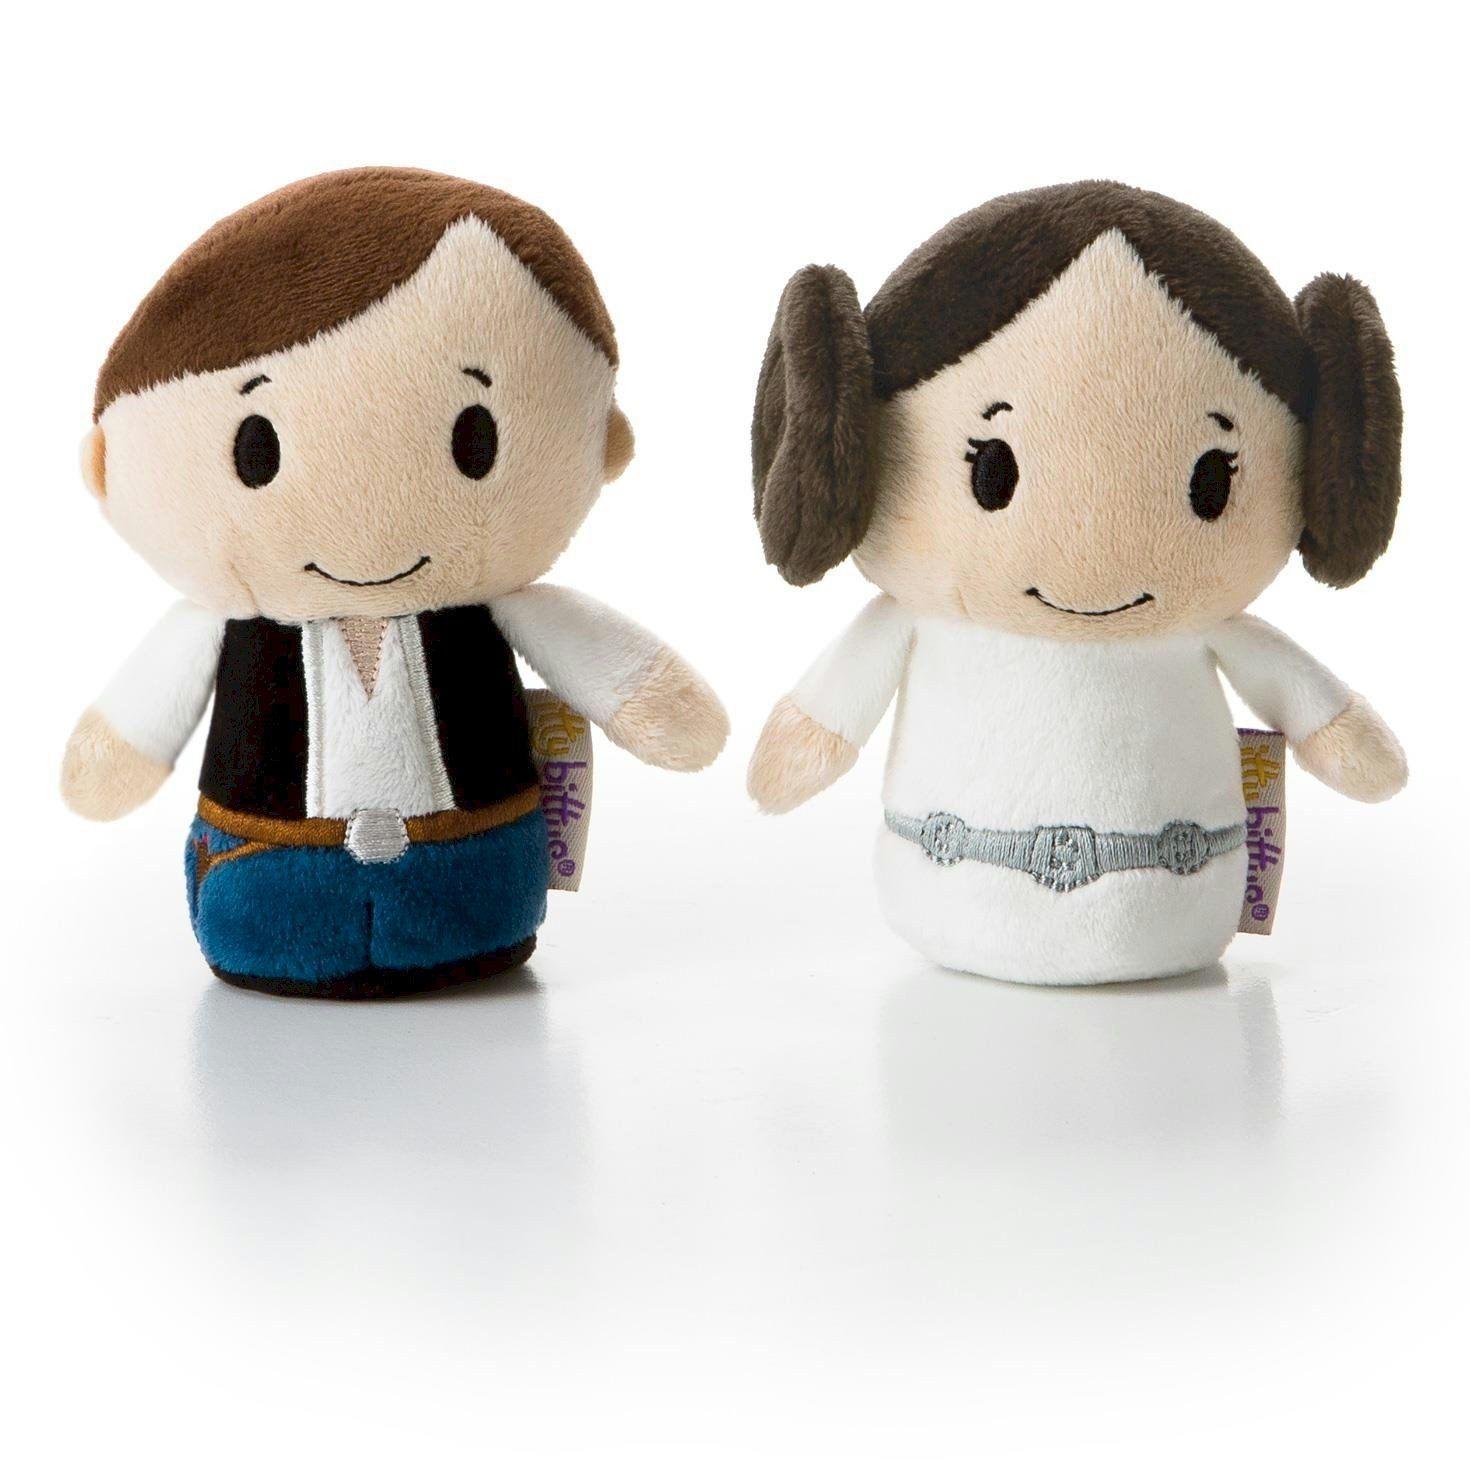 Amazon.com: Hallmark itty bittys Star Wars Han Solo and Princess ...